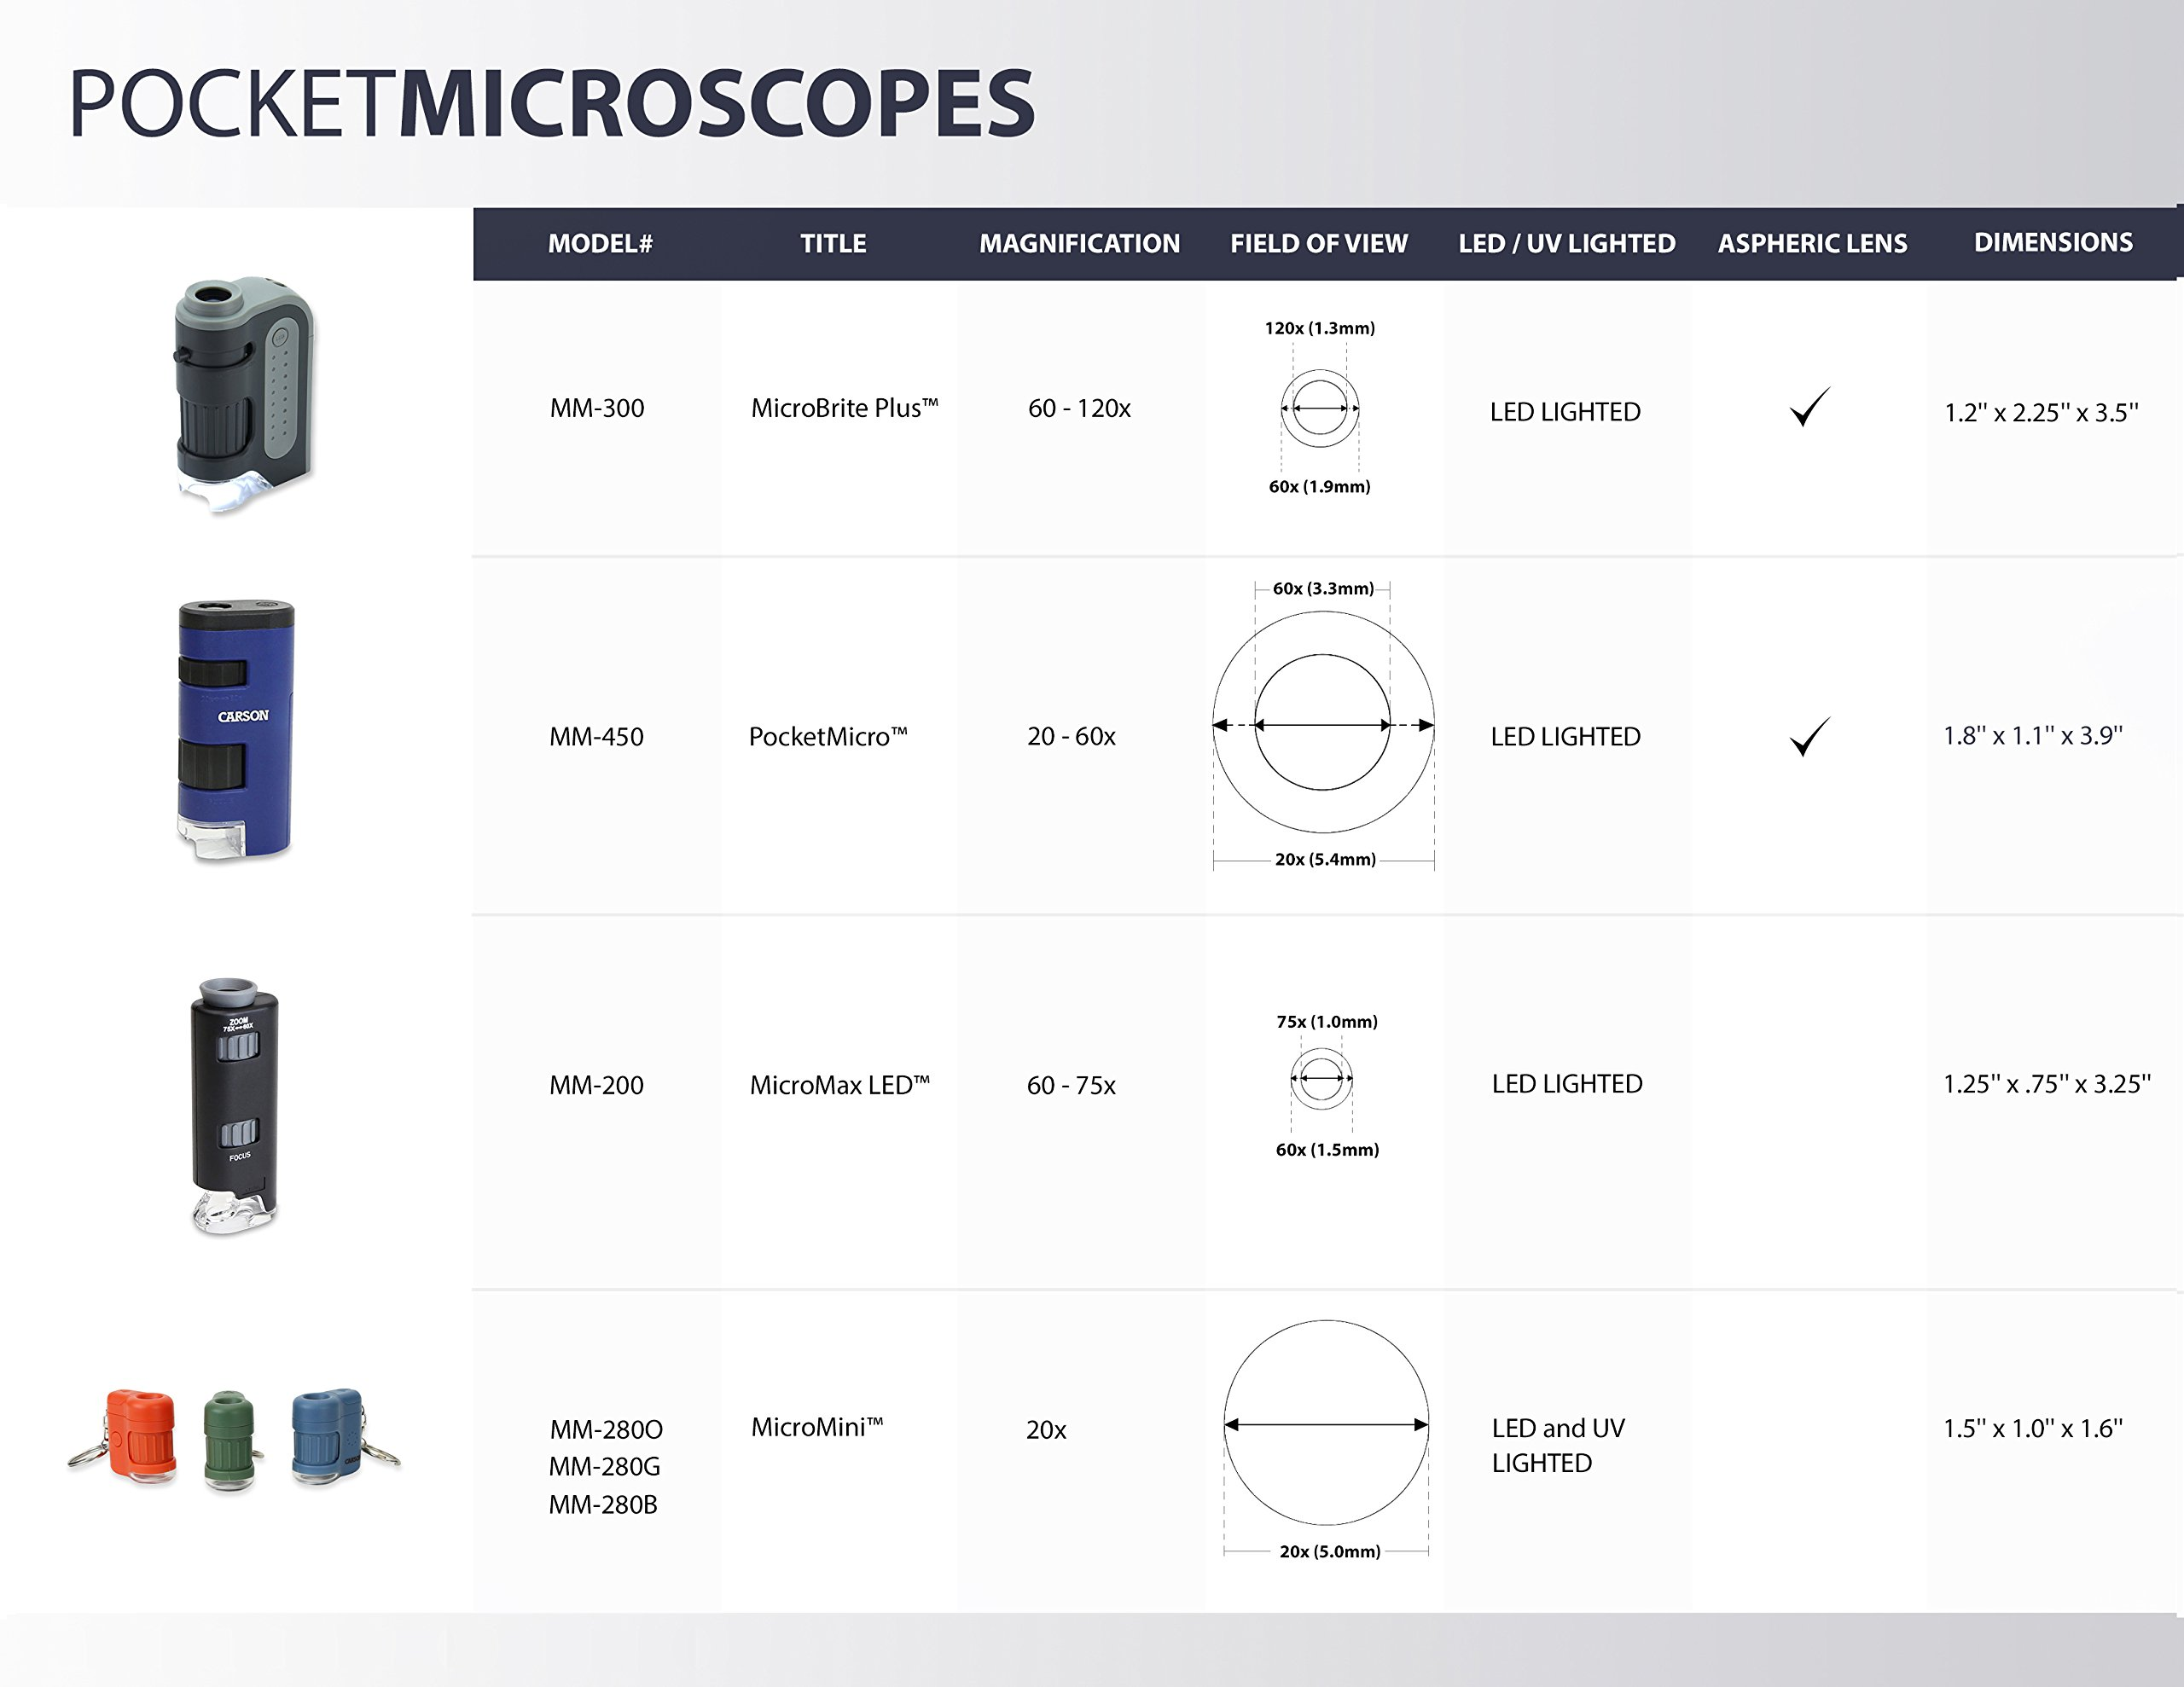 Carson MicroBrite Plus 60x-120x Power LED Lighted Pocket Microscope (MM-300) - 81 2B4GkrirrL - Carson MicroBrite Plus 60x-120x Power LED Lighted Pocket Microscope (MM-300)